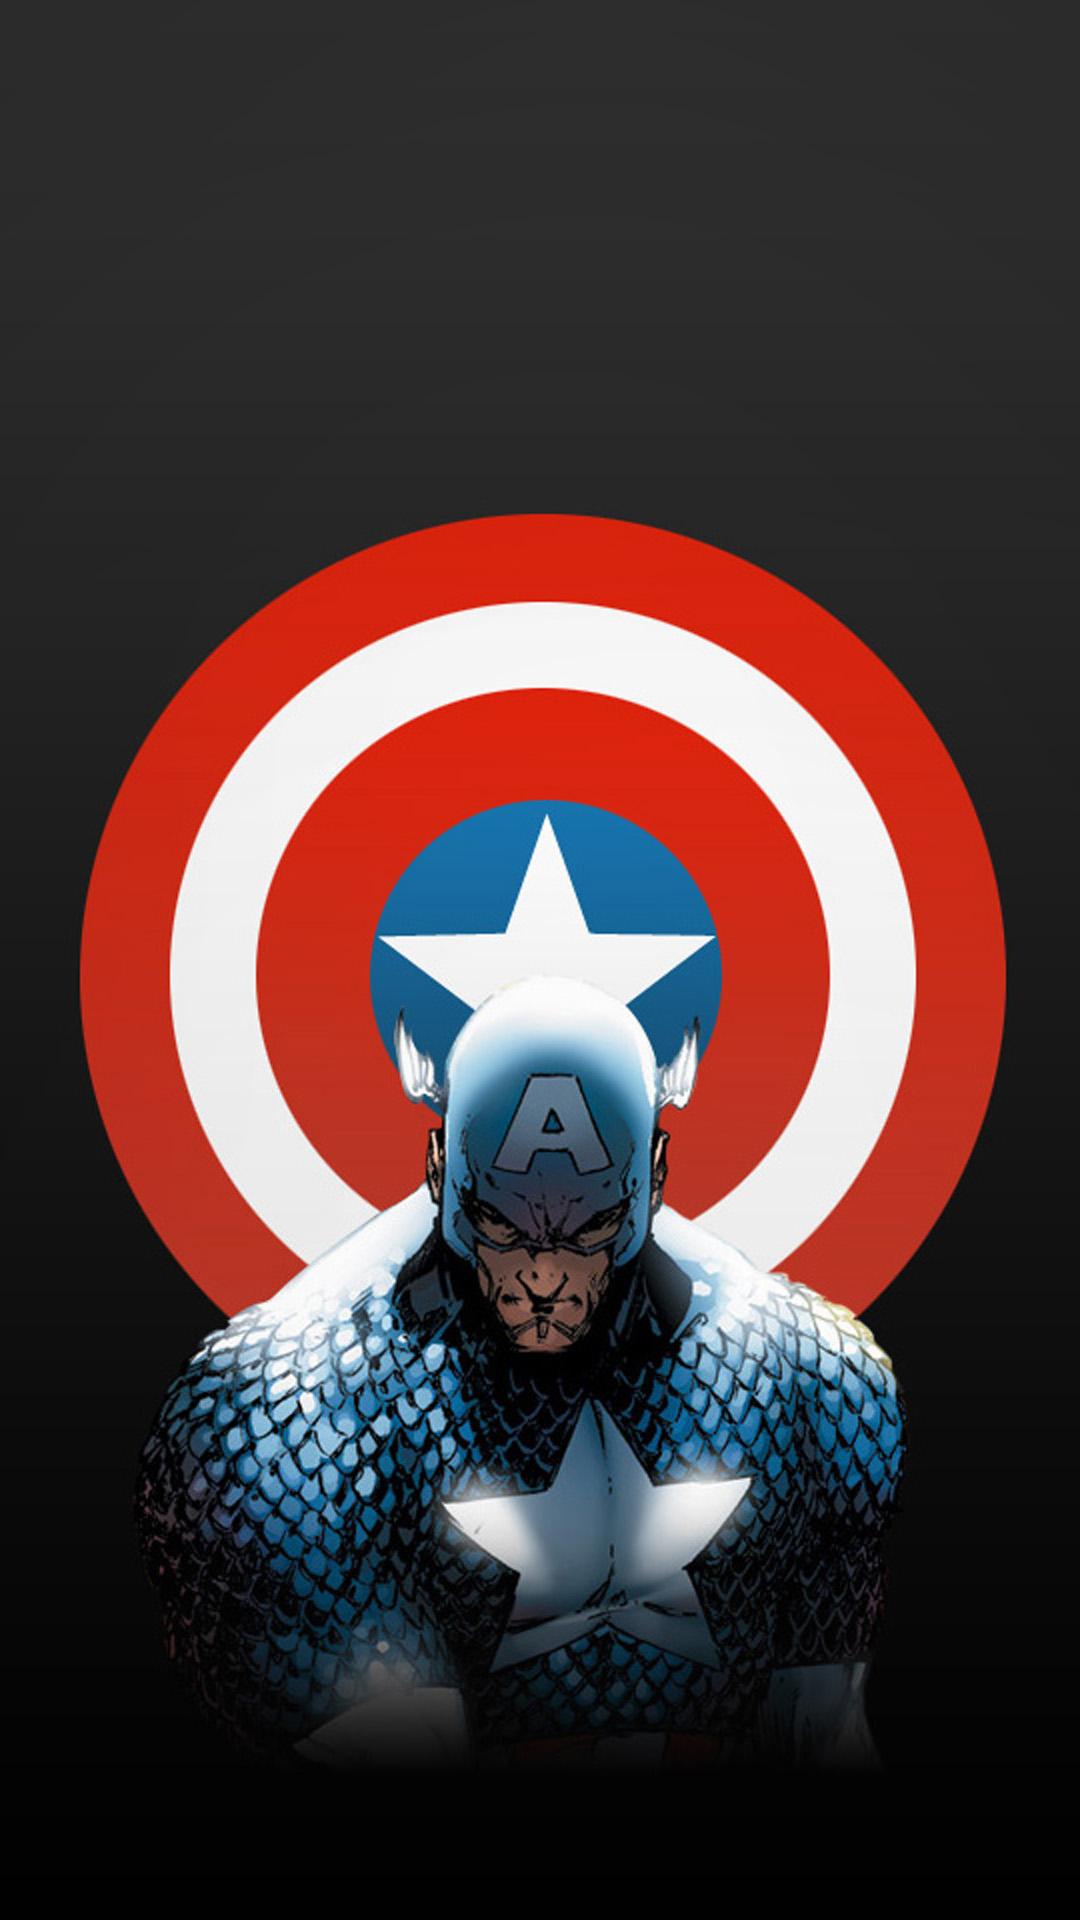 Beautiful Quotes Wallpapers Hd Captain America Iphone Images Pixelstalk Net